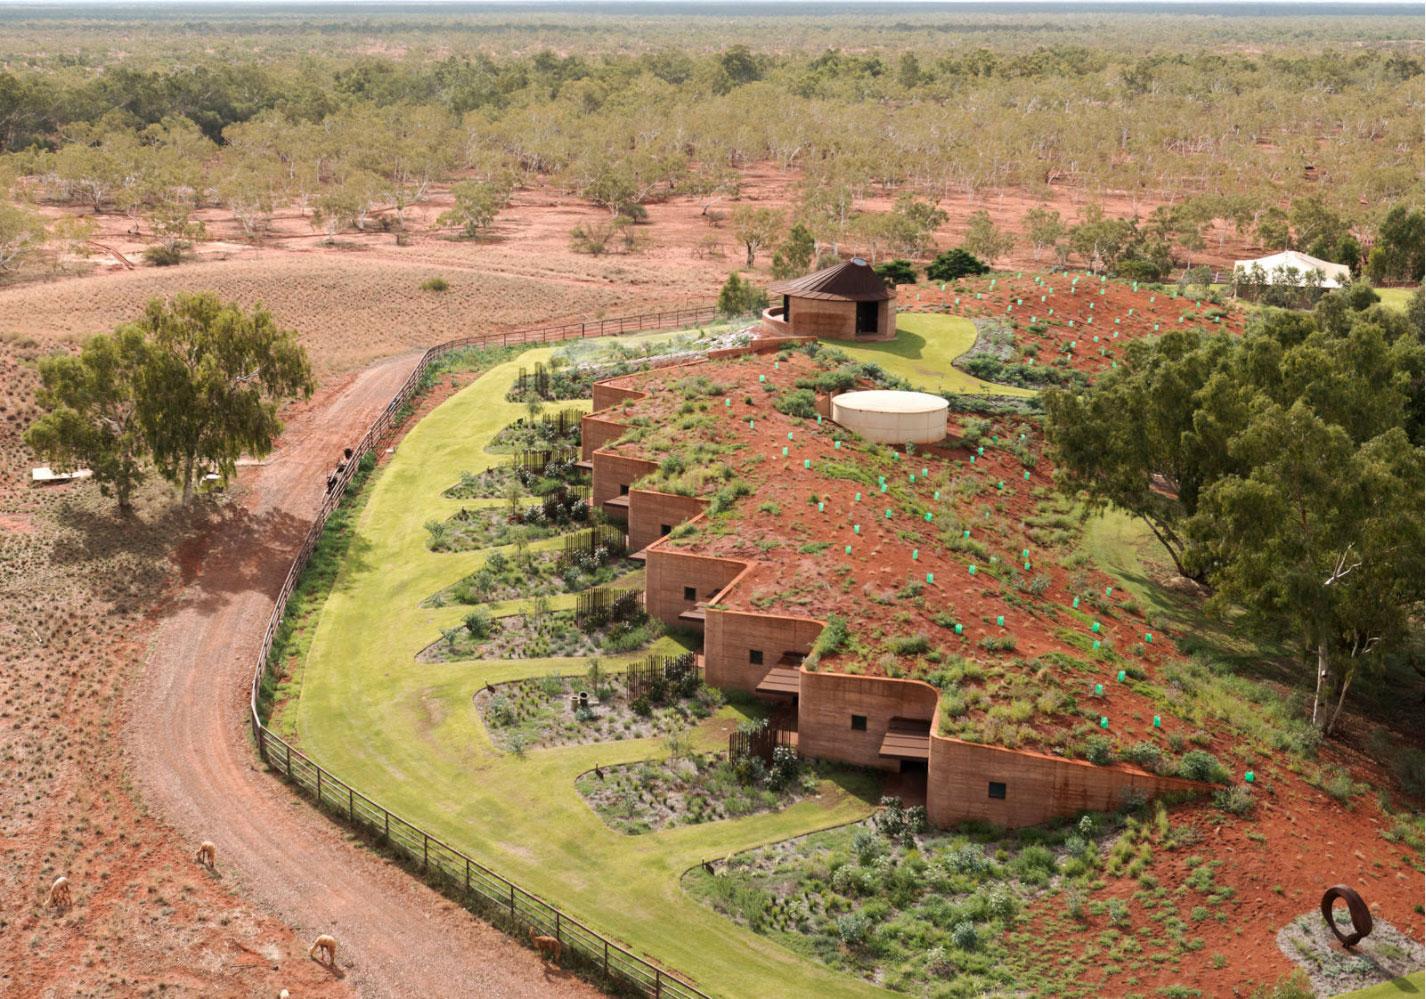 living roof building bermed into the landscape